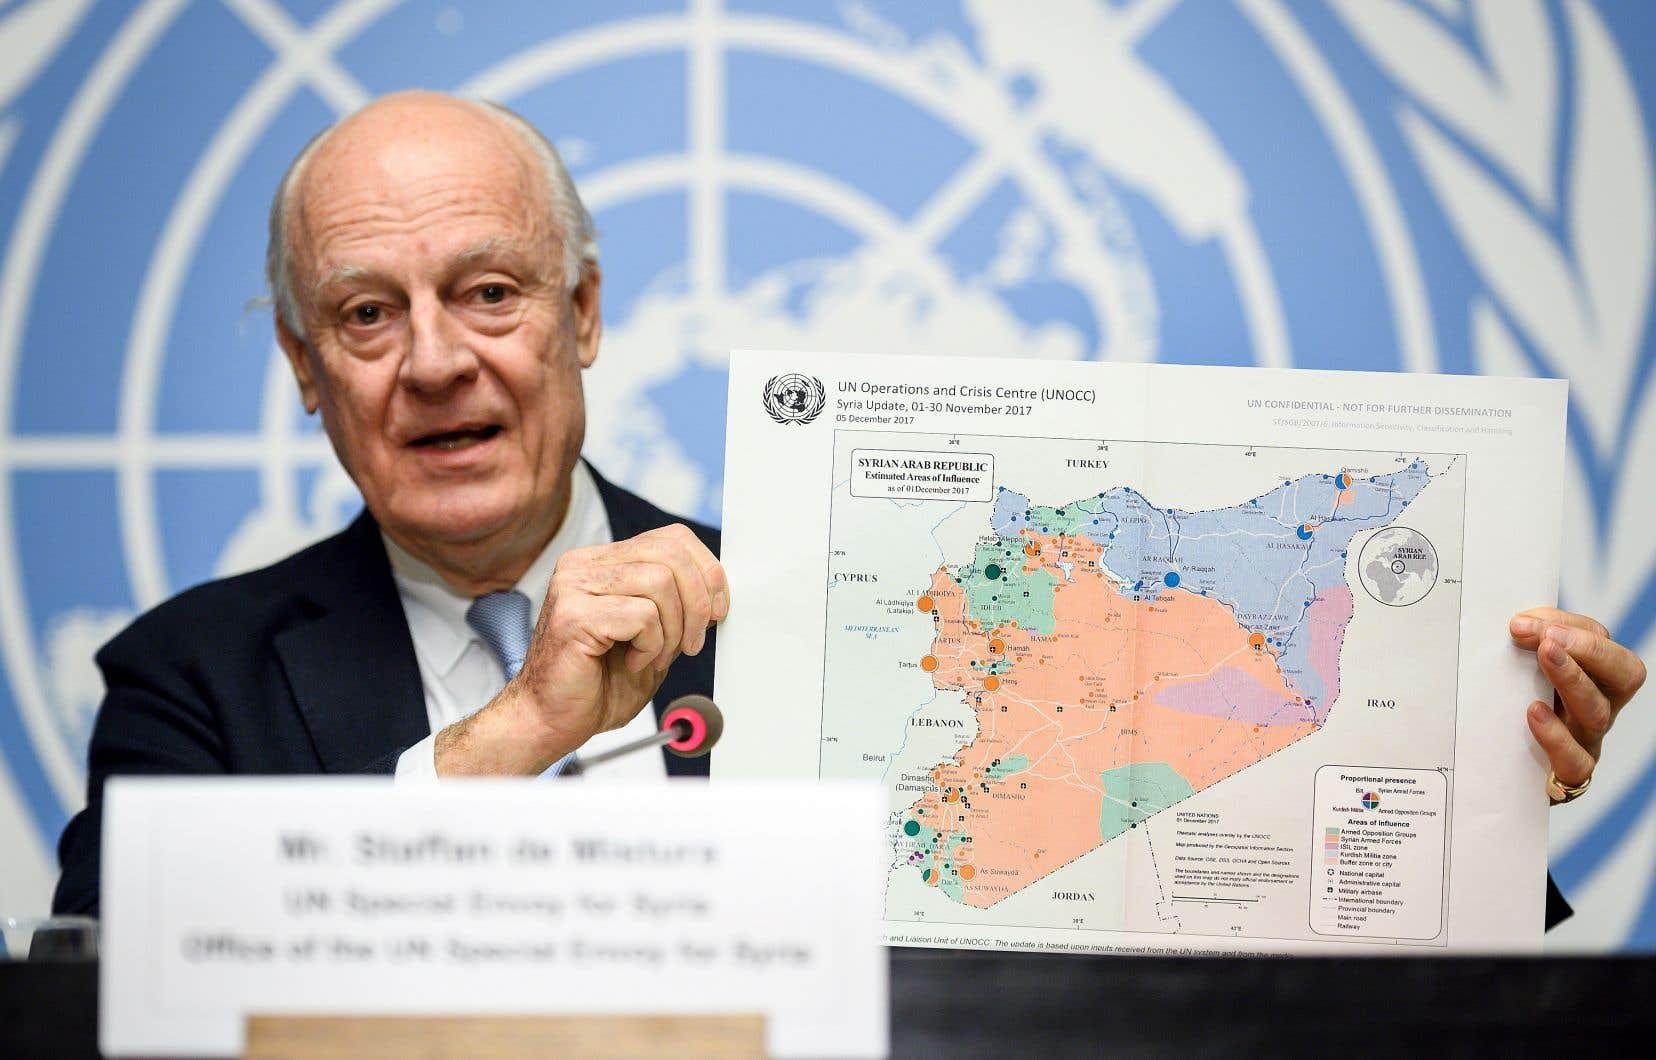 Le médiateur de l'ONU, Staffan de Mistura, en conférence de presse à Genève jeudi